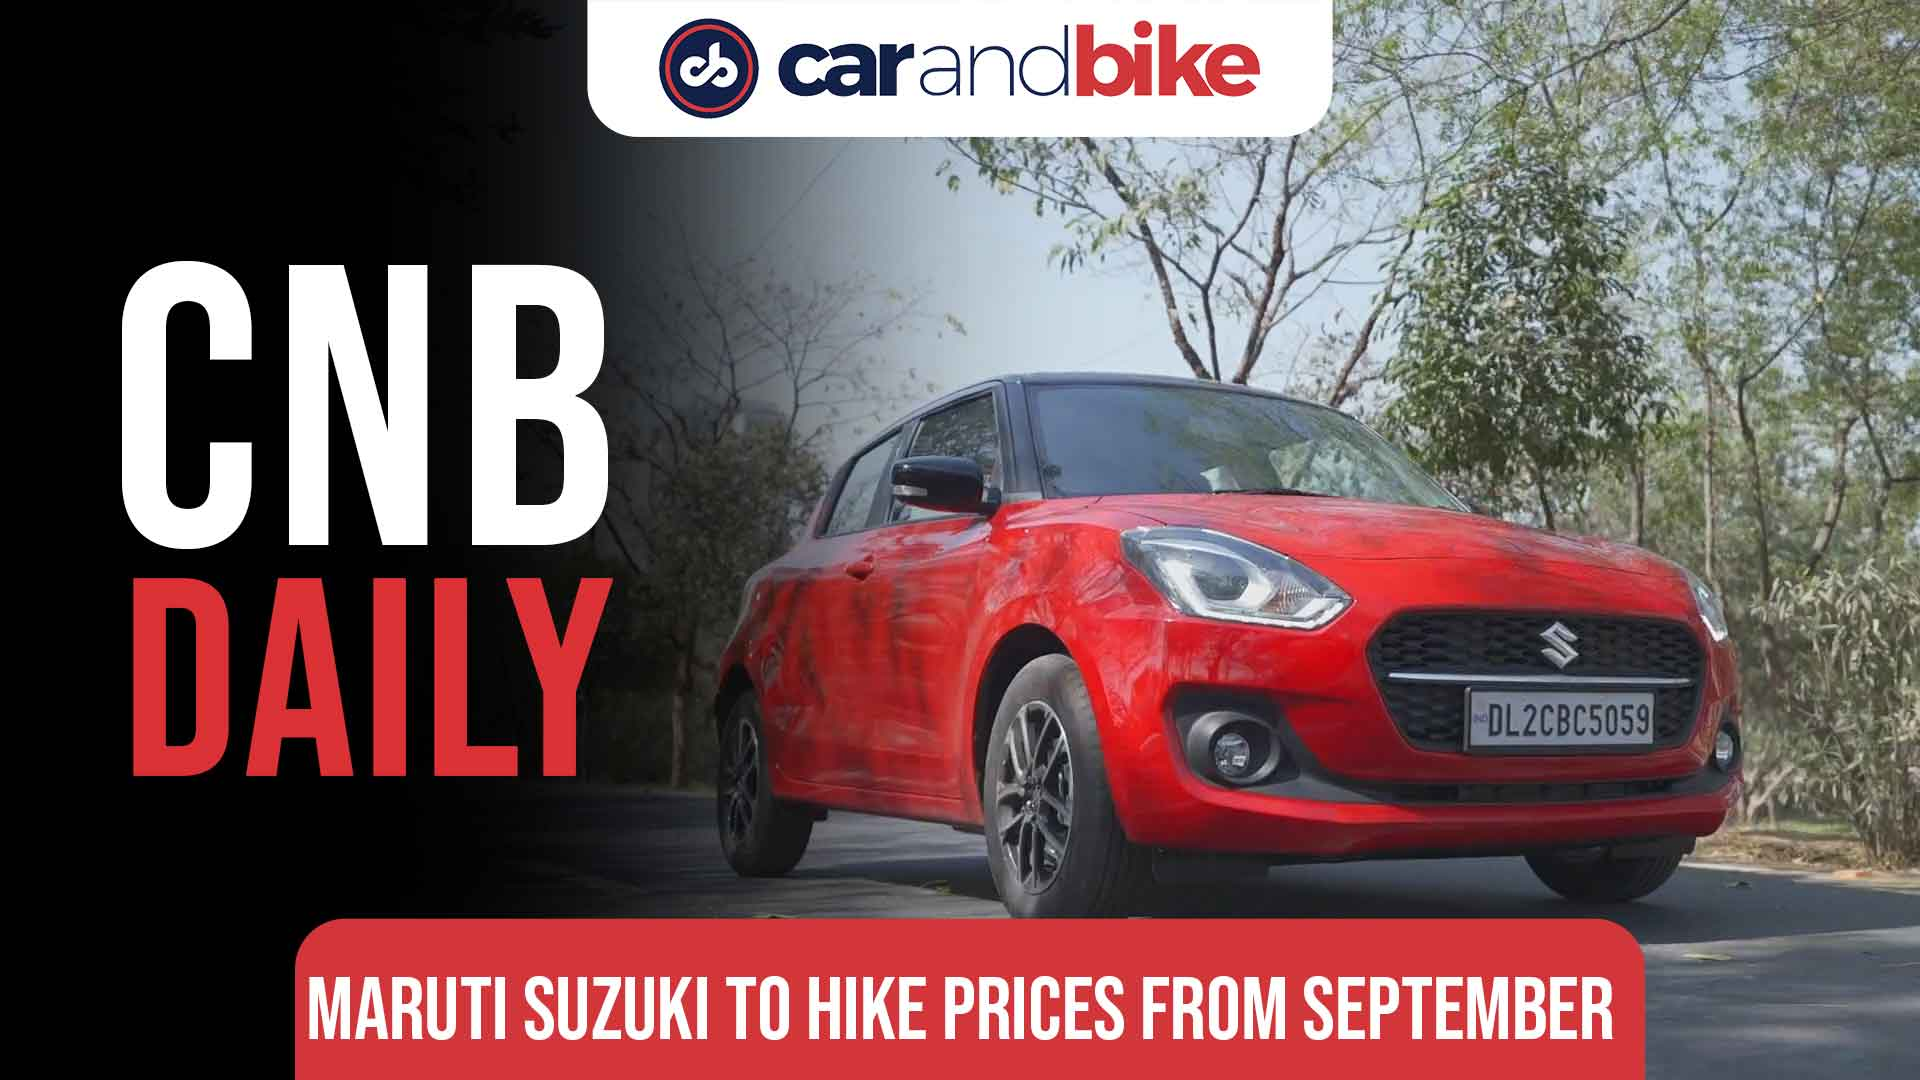 Maruti Suzuki to hike prices from September across range